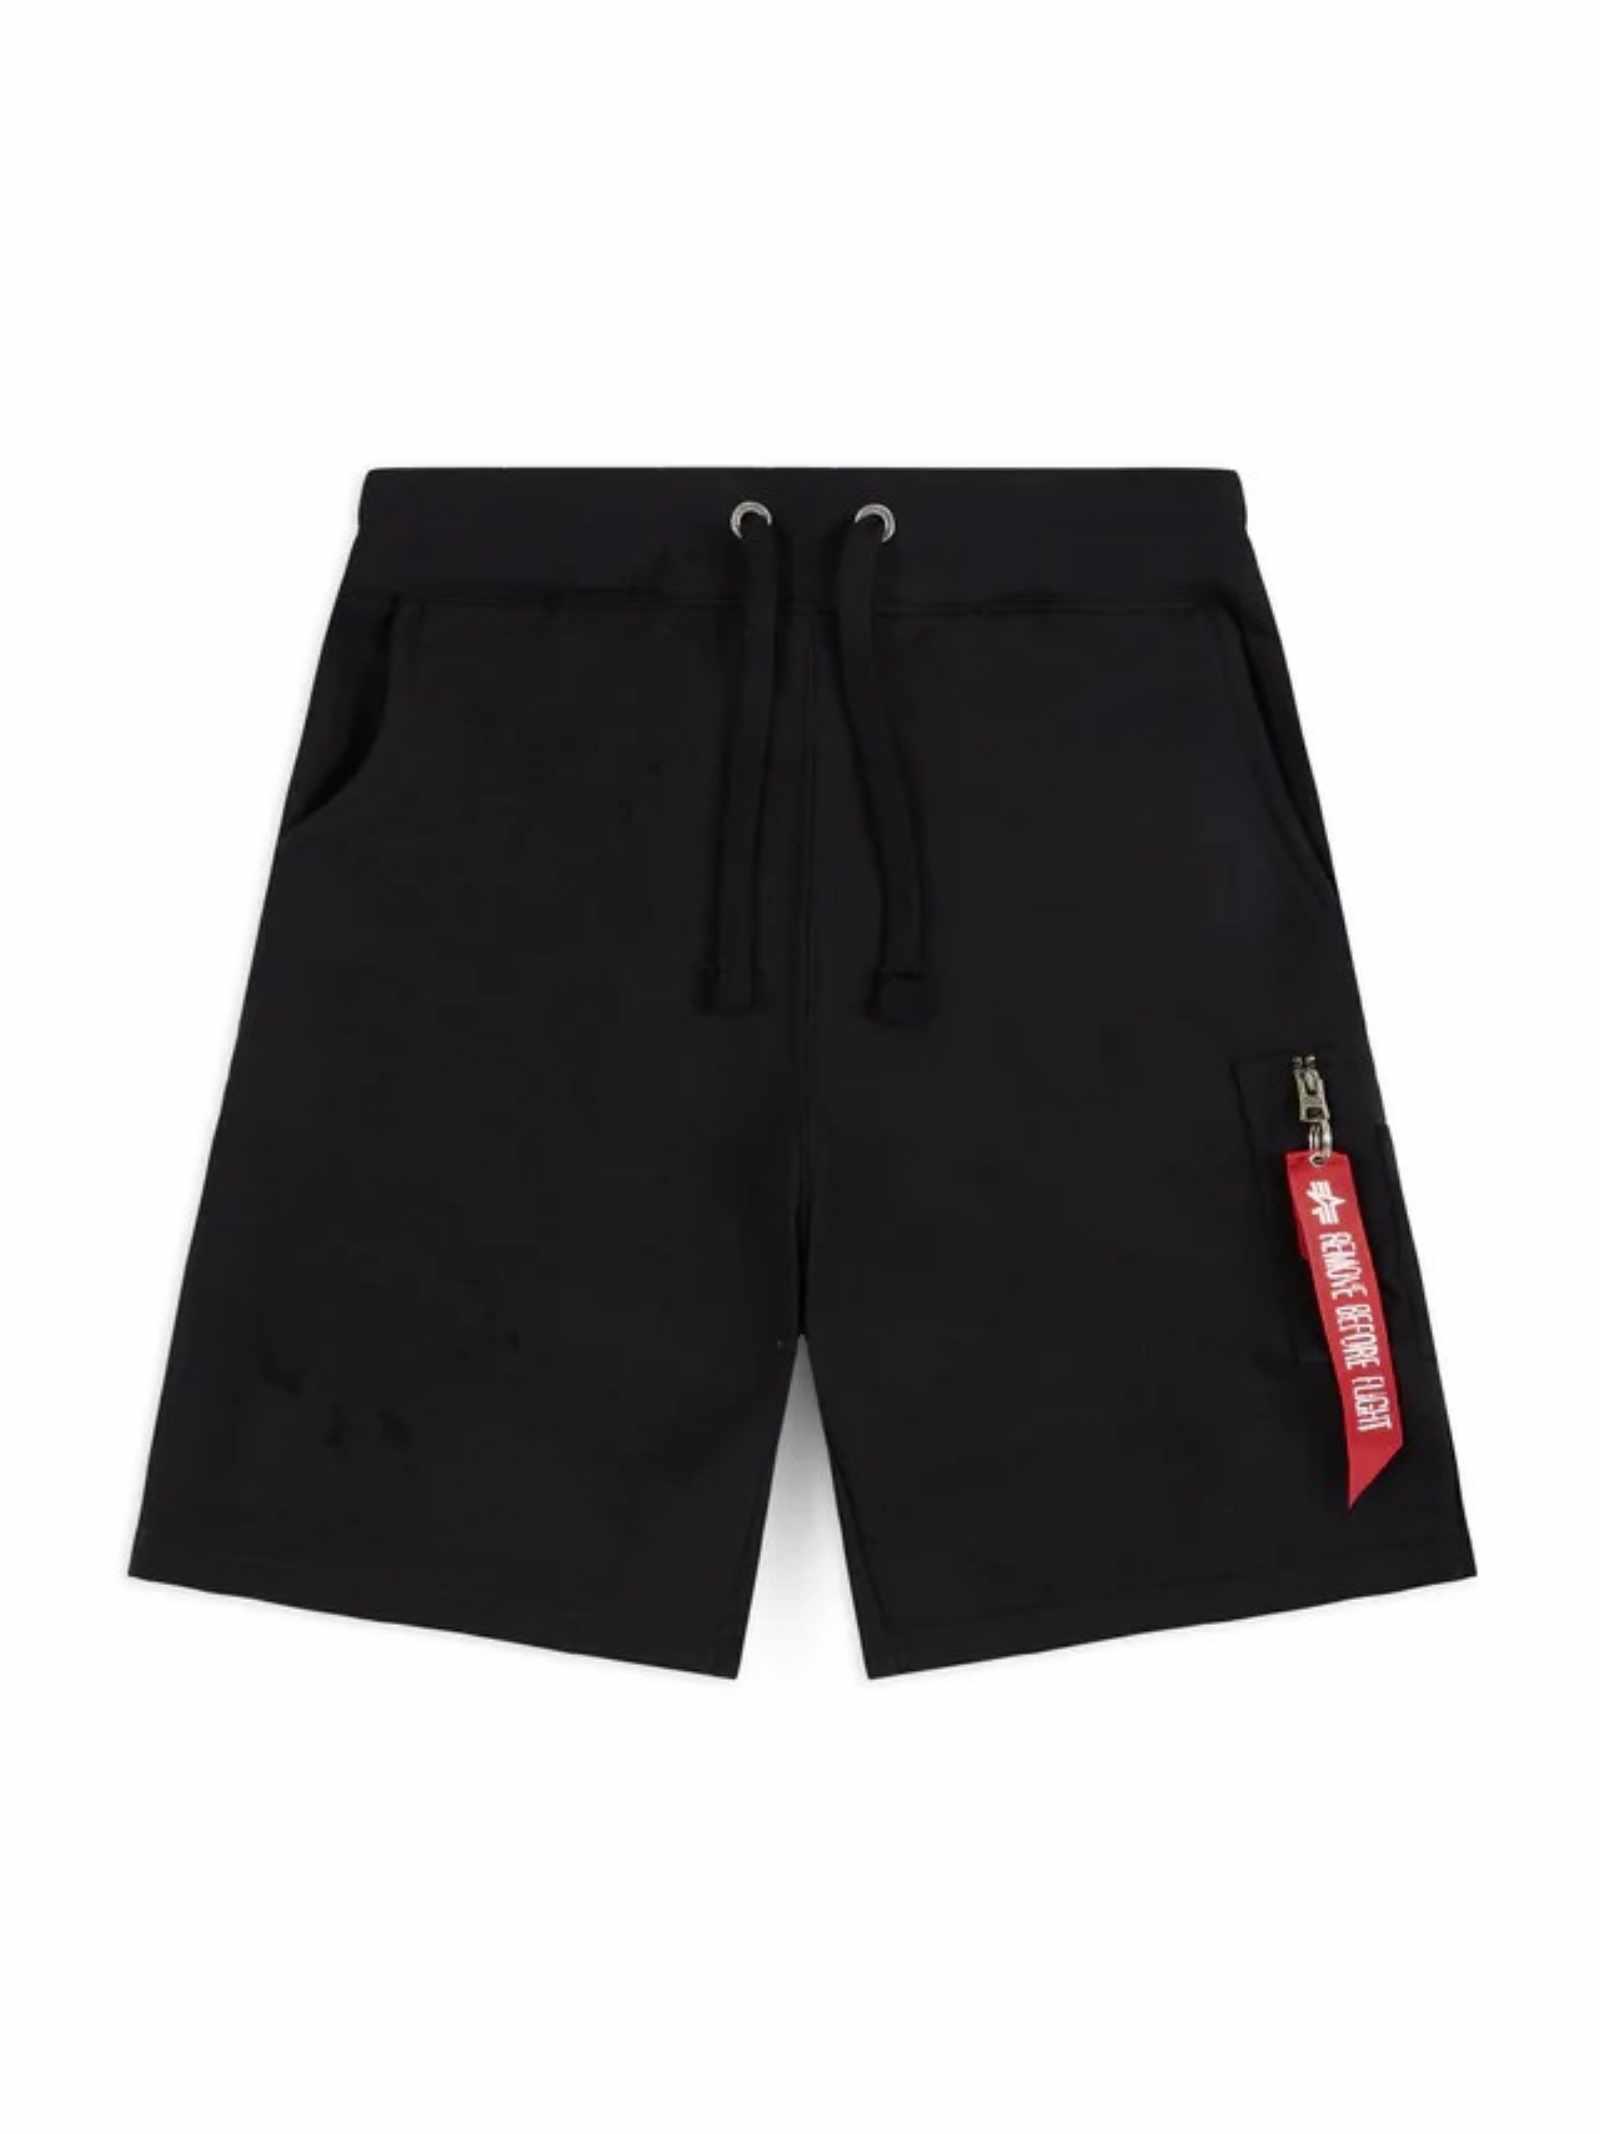 Pantaloncino in tuta nero ALPHA INDUSTRIES   Shorts   16630103